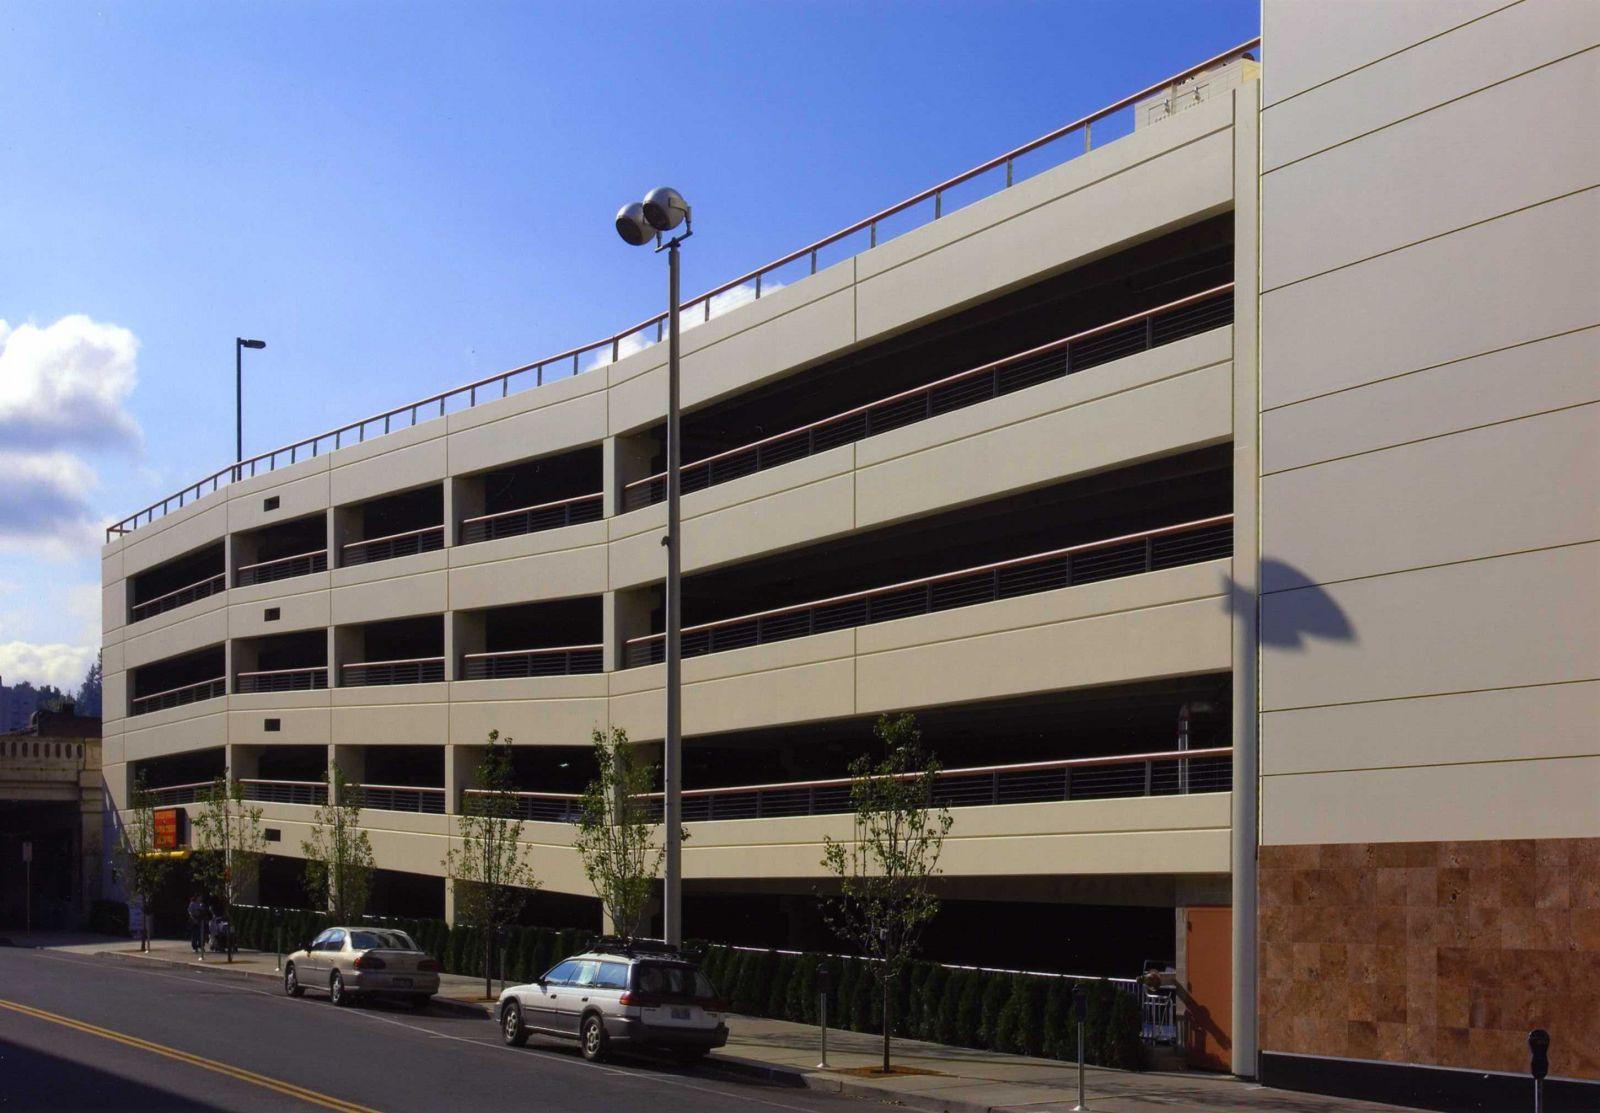 Parking Structure Coatings - DCI Flooring